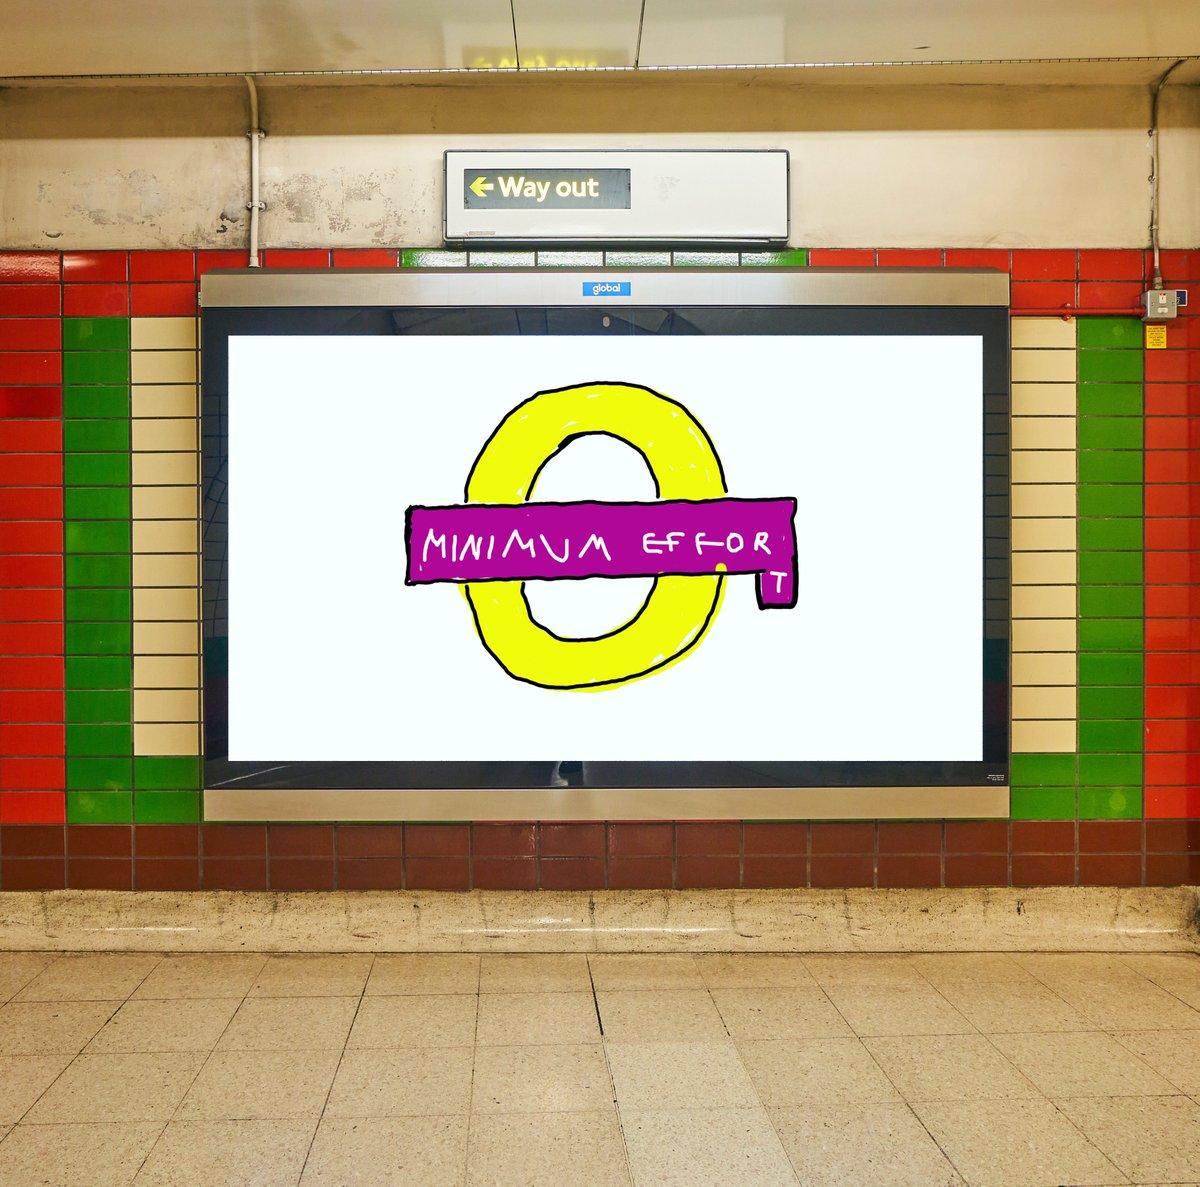 E1LEBnJX0AAcnVq?format=jpg&name=medium - Everyone hates Hockney's latest 'art'